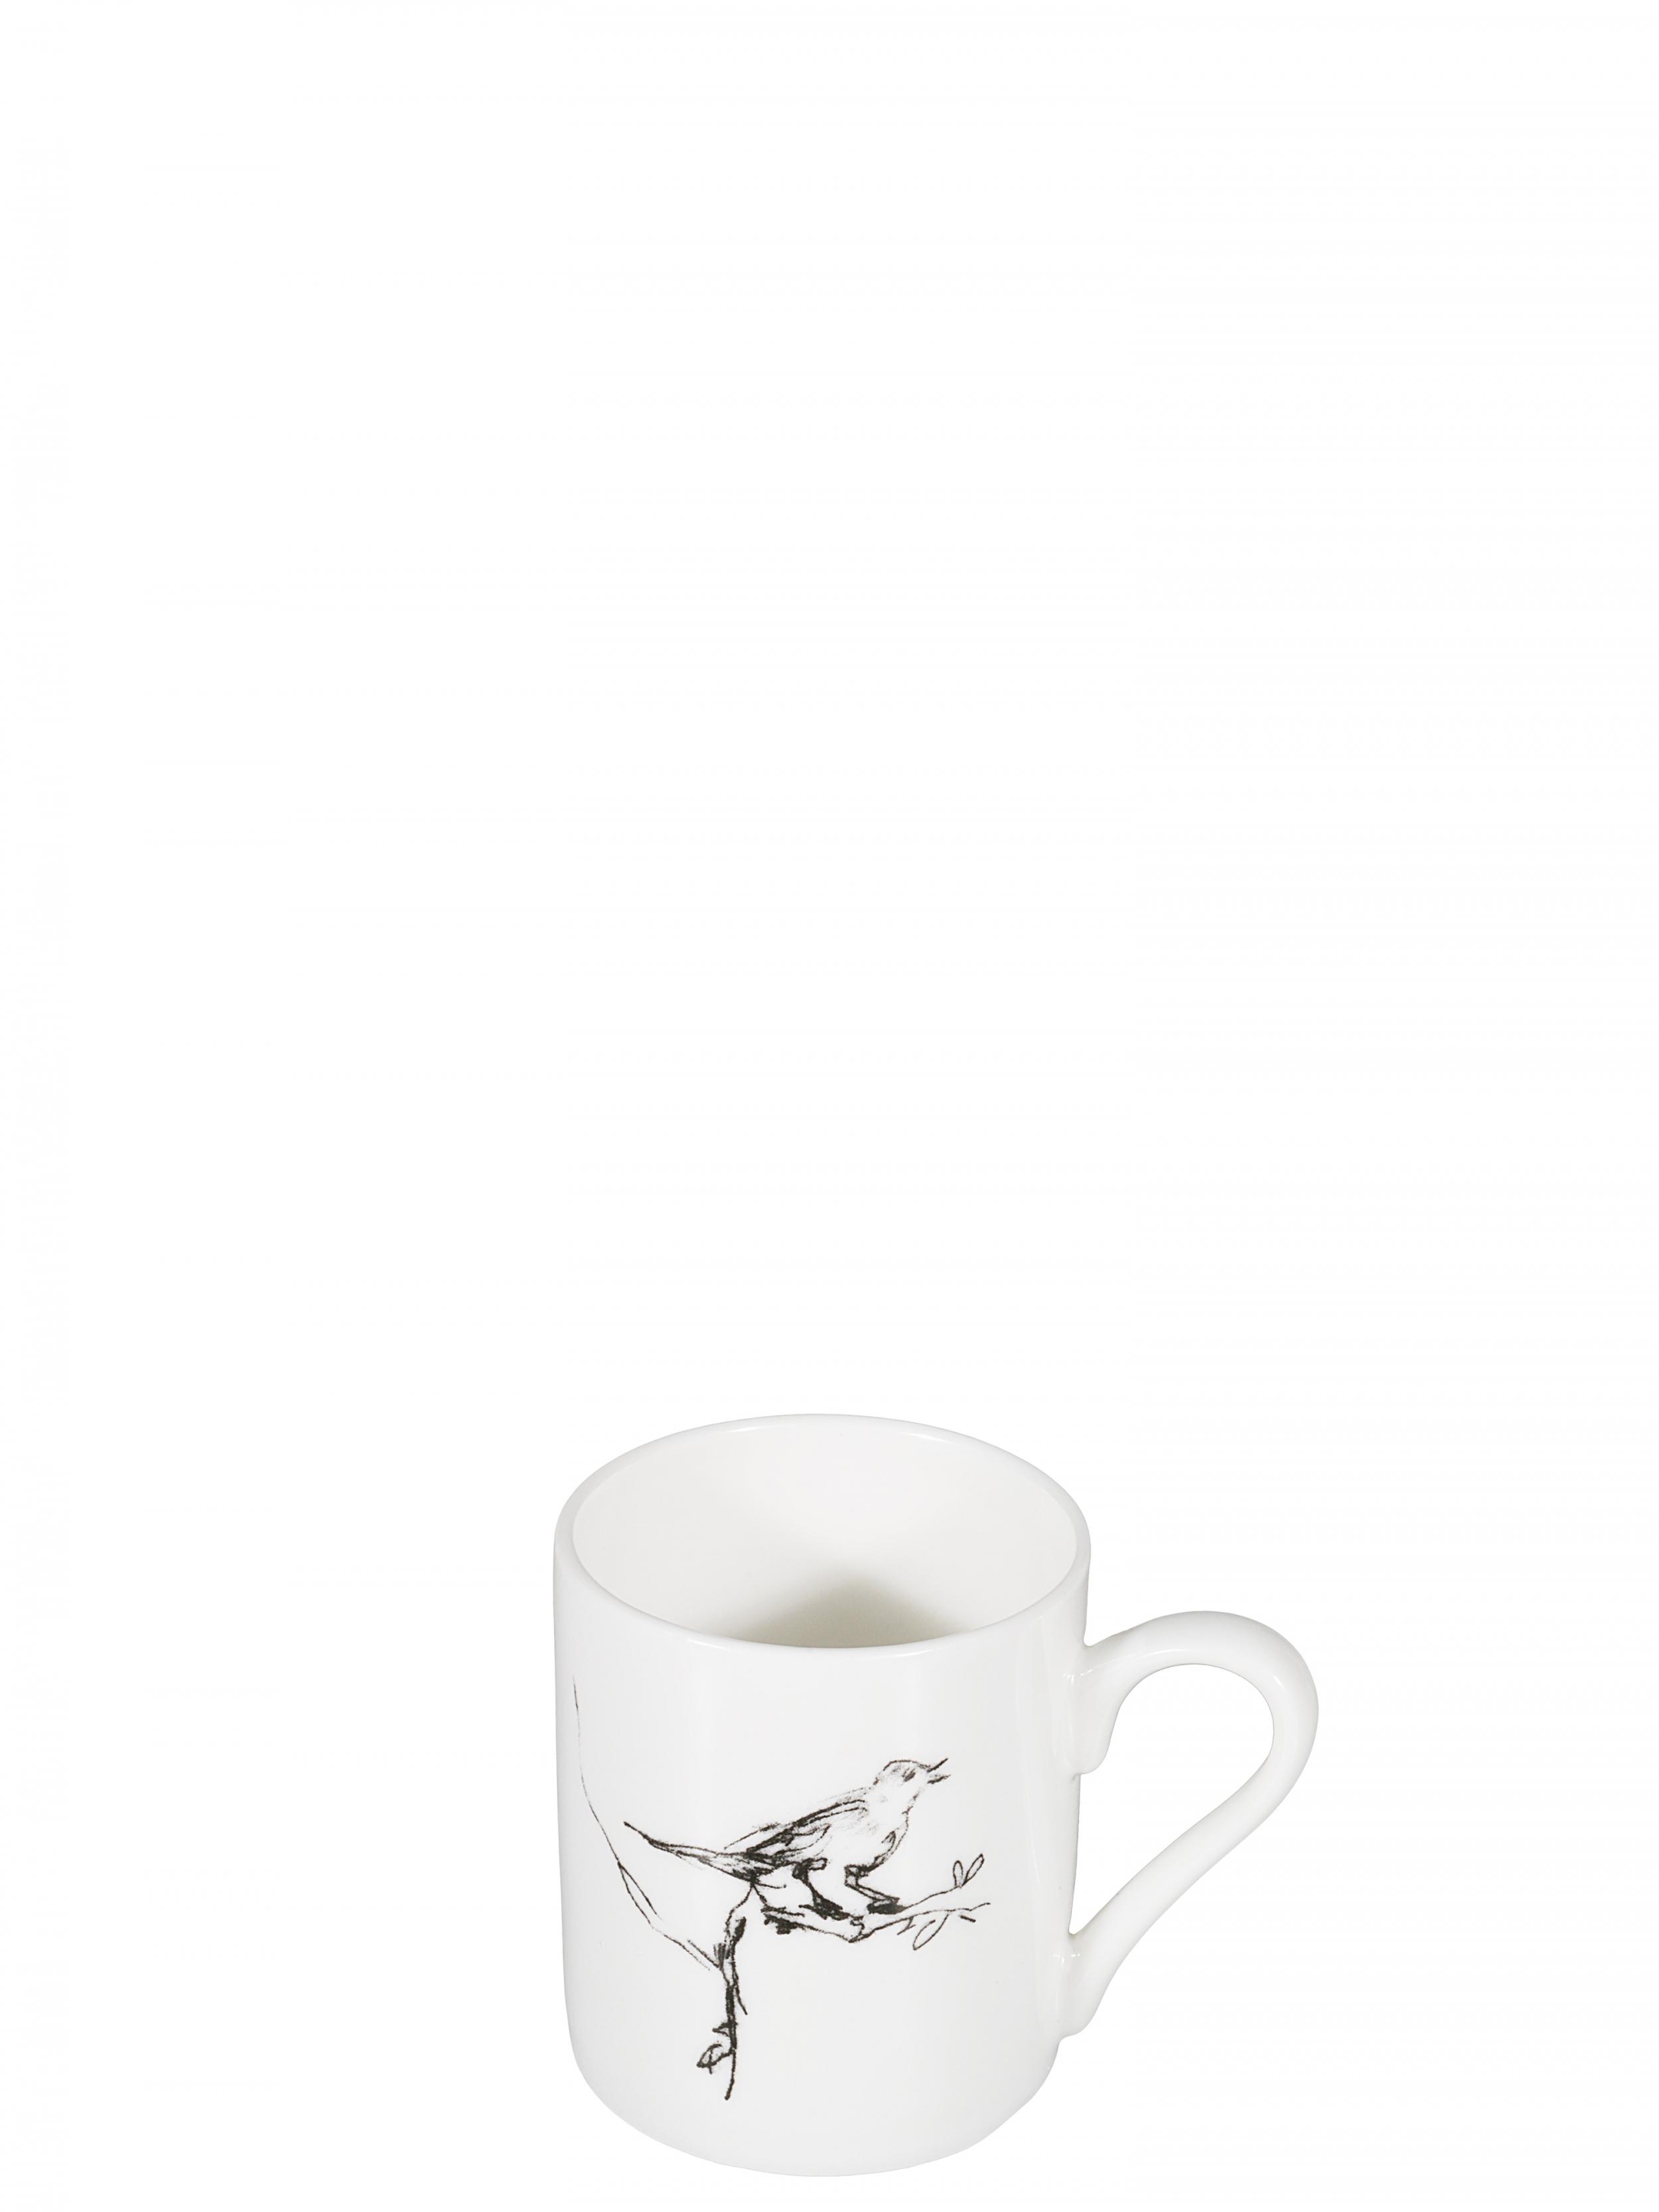 2500x3333 Tracey Emin Coffee Cup And Saucer 10 Corso Como